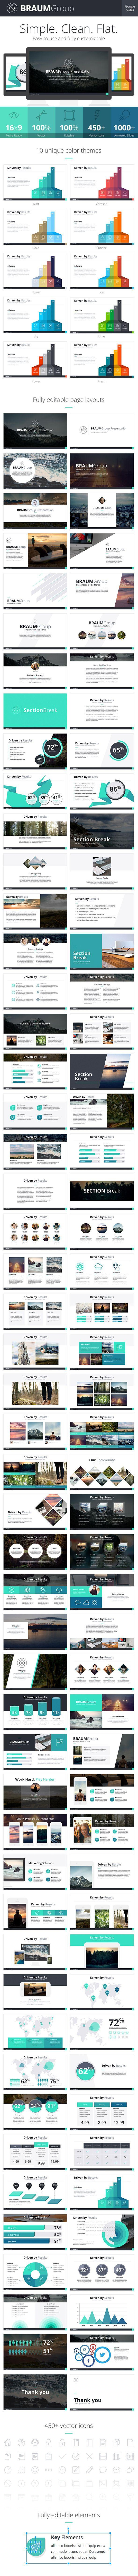 Braum Google slides Presentation Template | Presentation templates ...